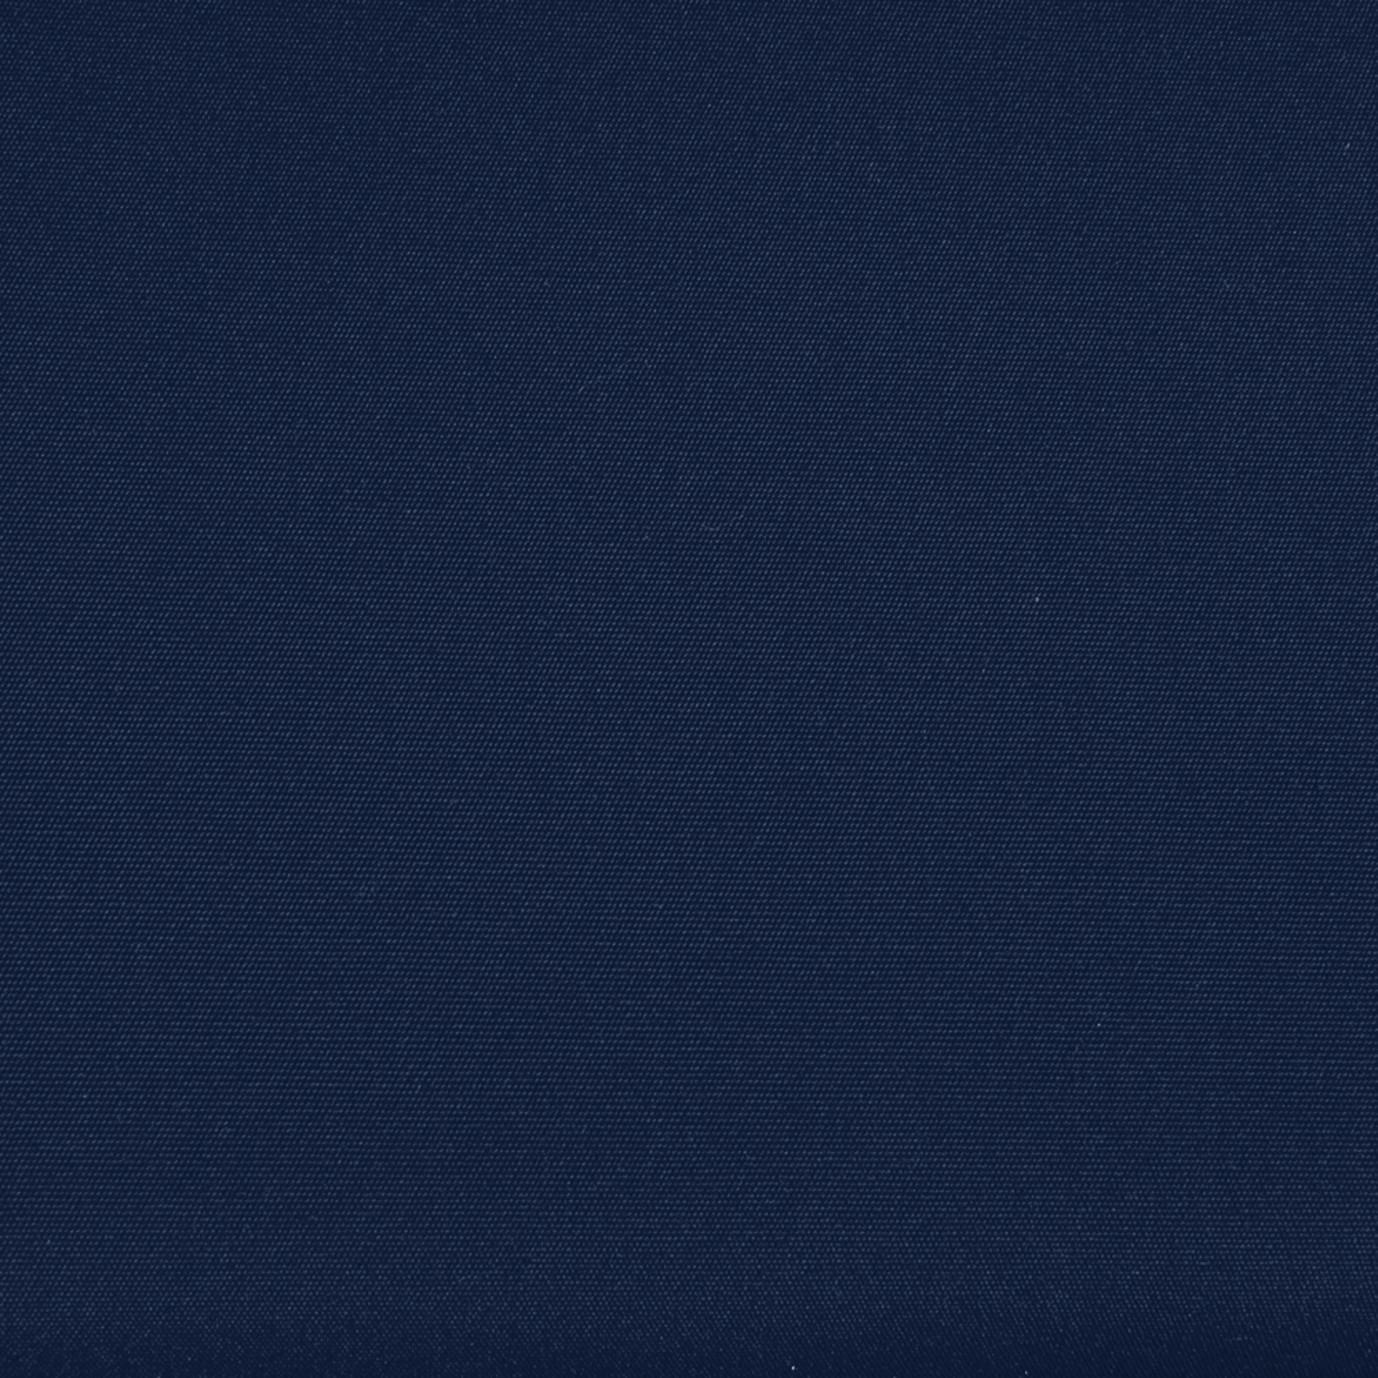 Deco™ Club Ottomans - Navy Blue